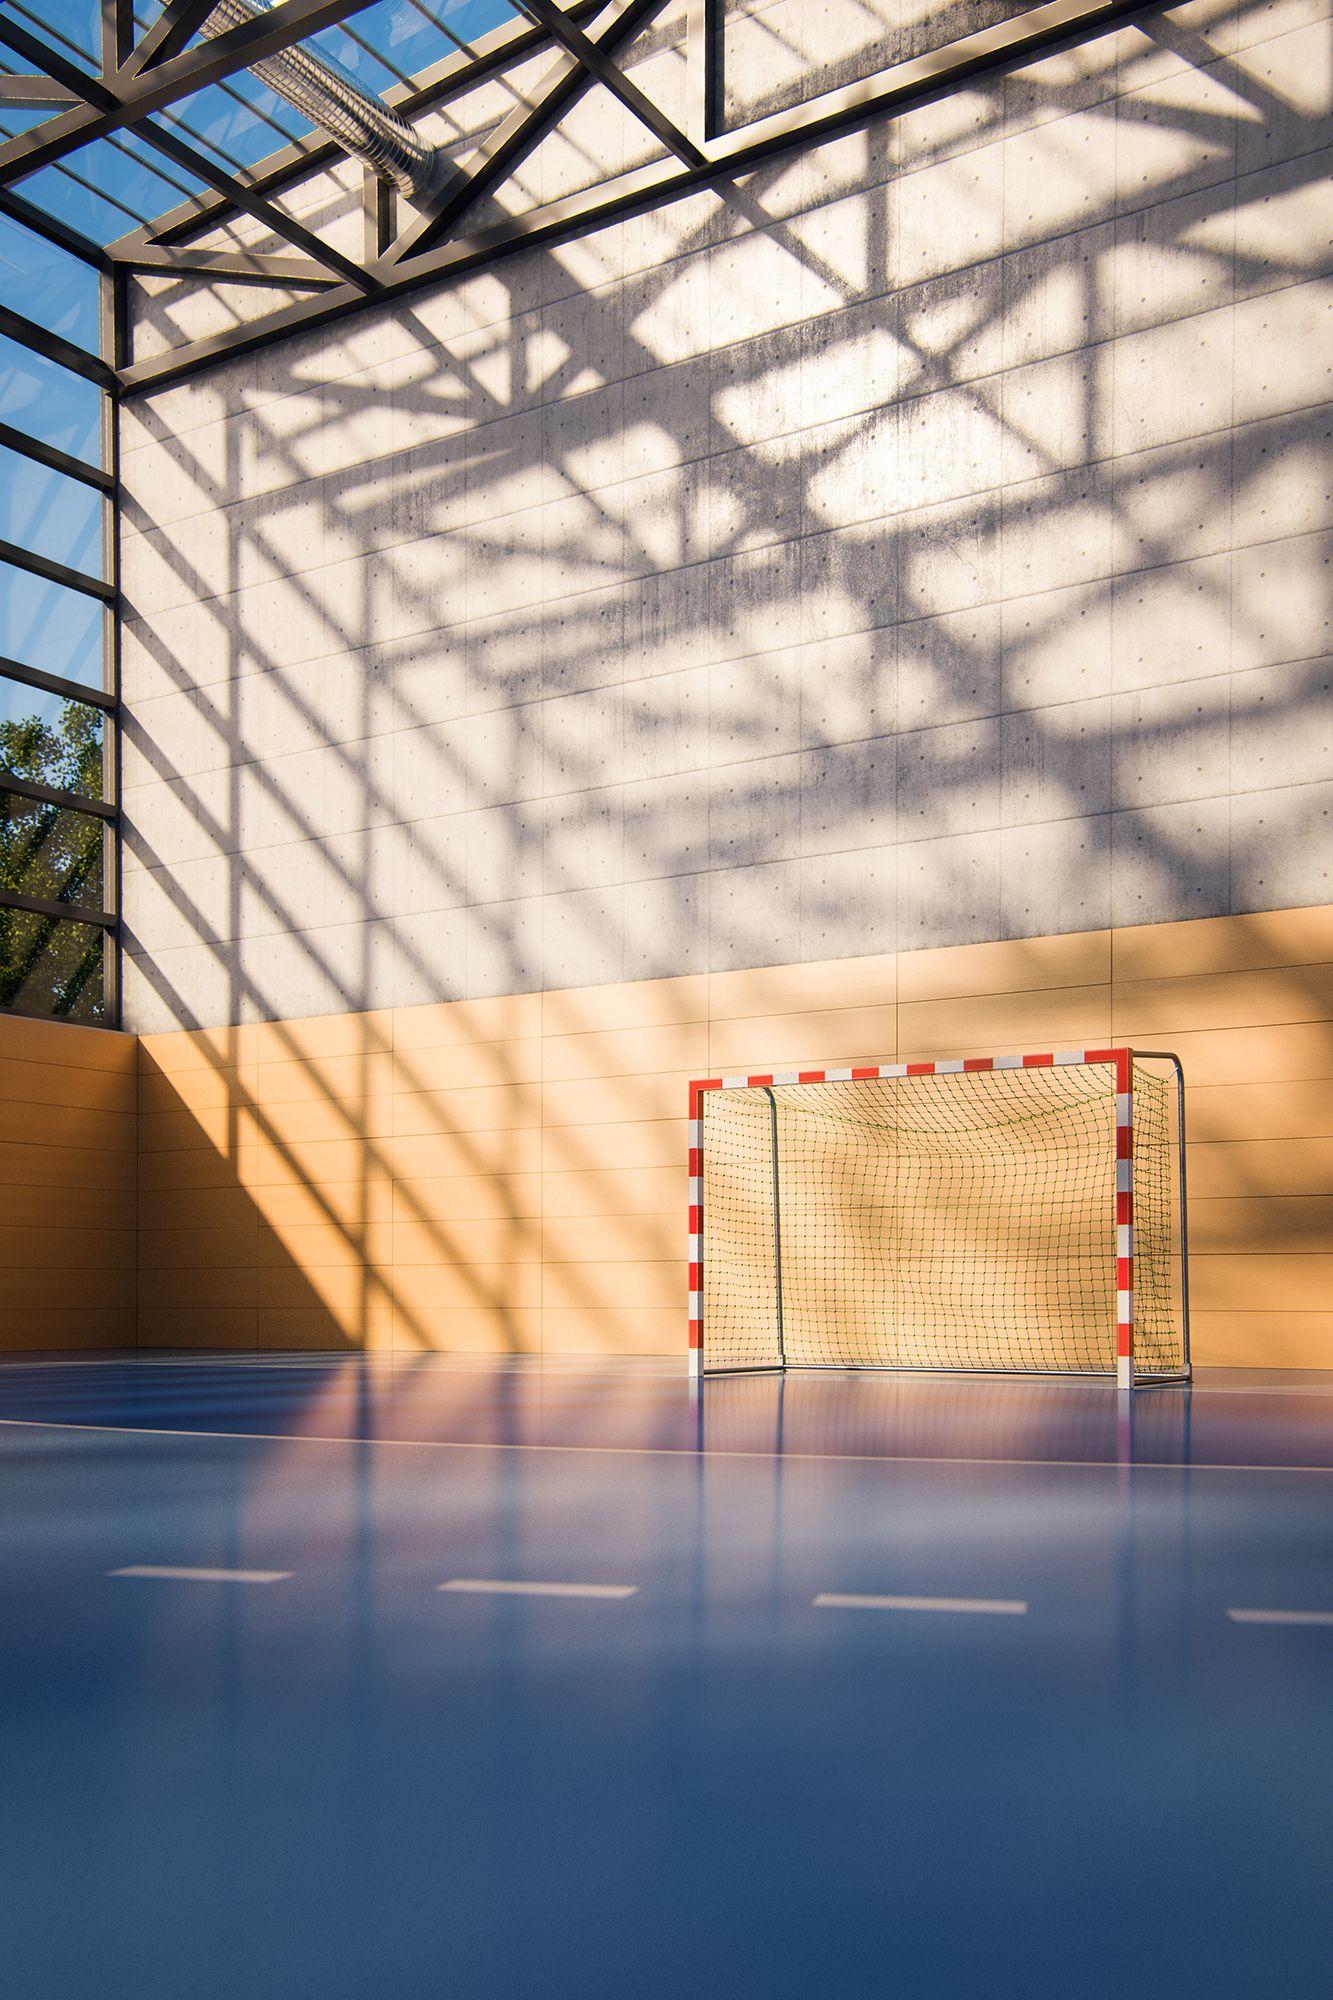 Handball Court On Behance In 2020 Handball Volleyball Workouts Handball Players